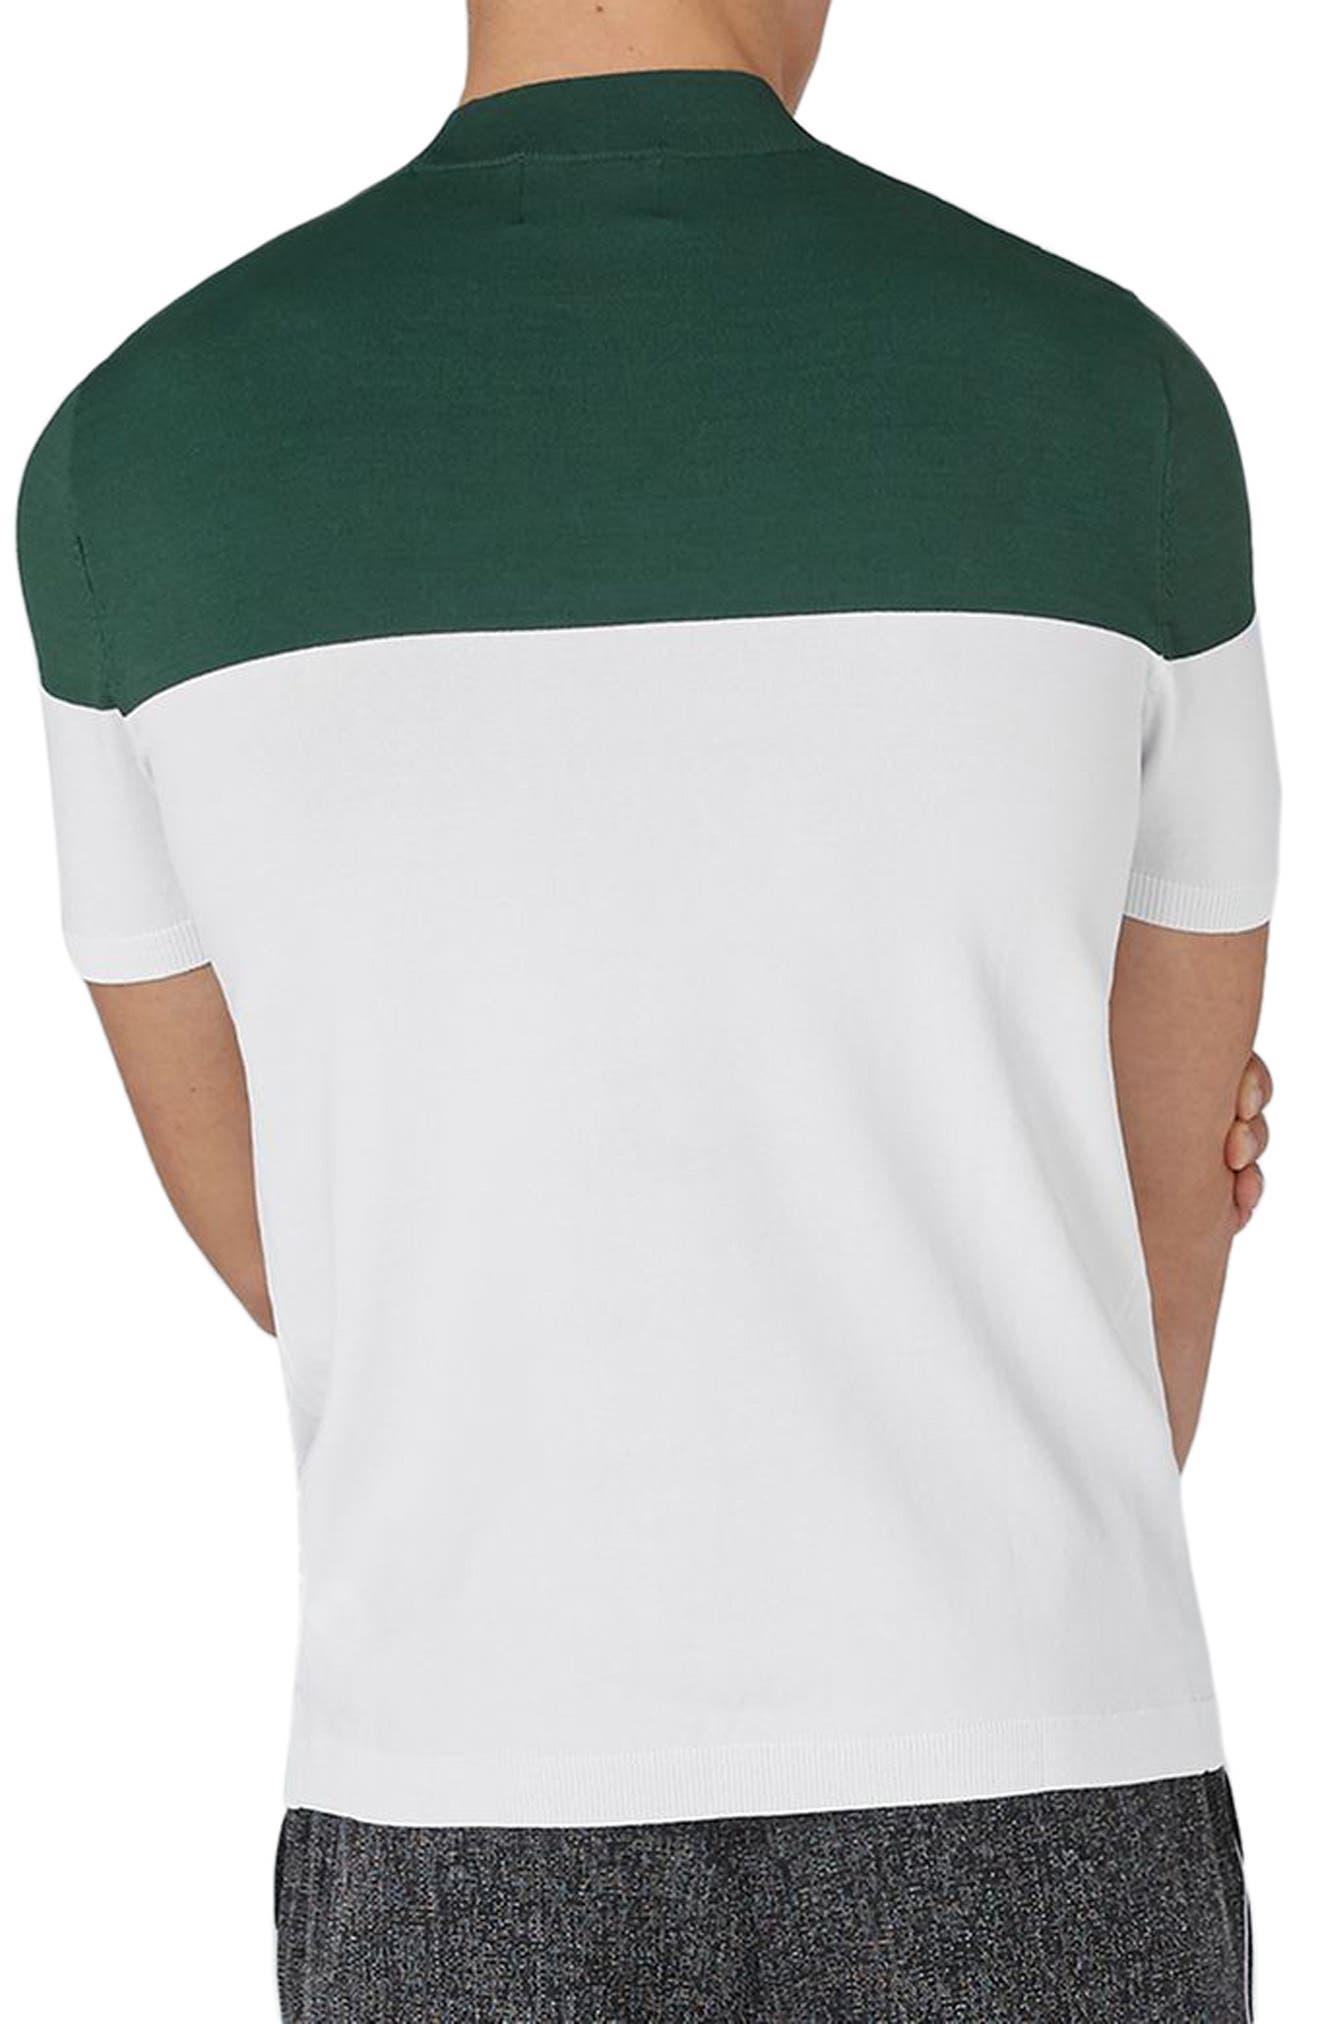 Colorblock Mock Neck Sweater,                             Alternate thumbnail 2, color,                             Green Multi